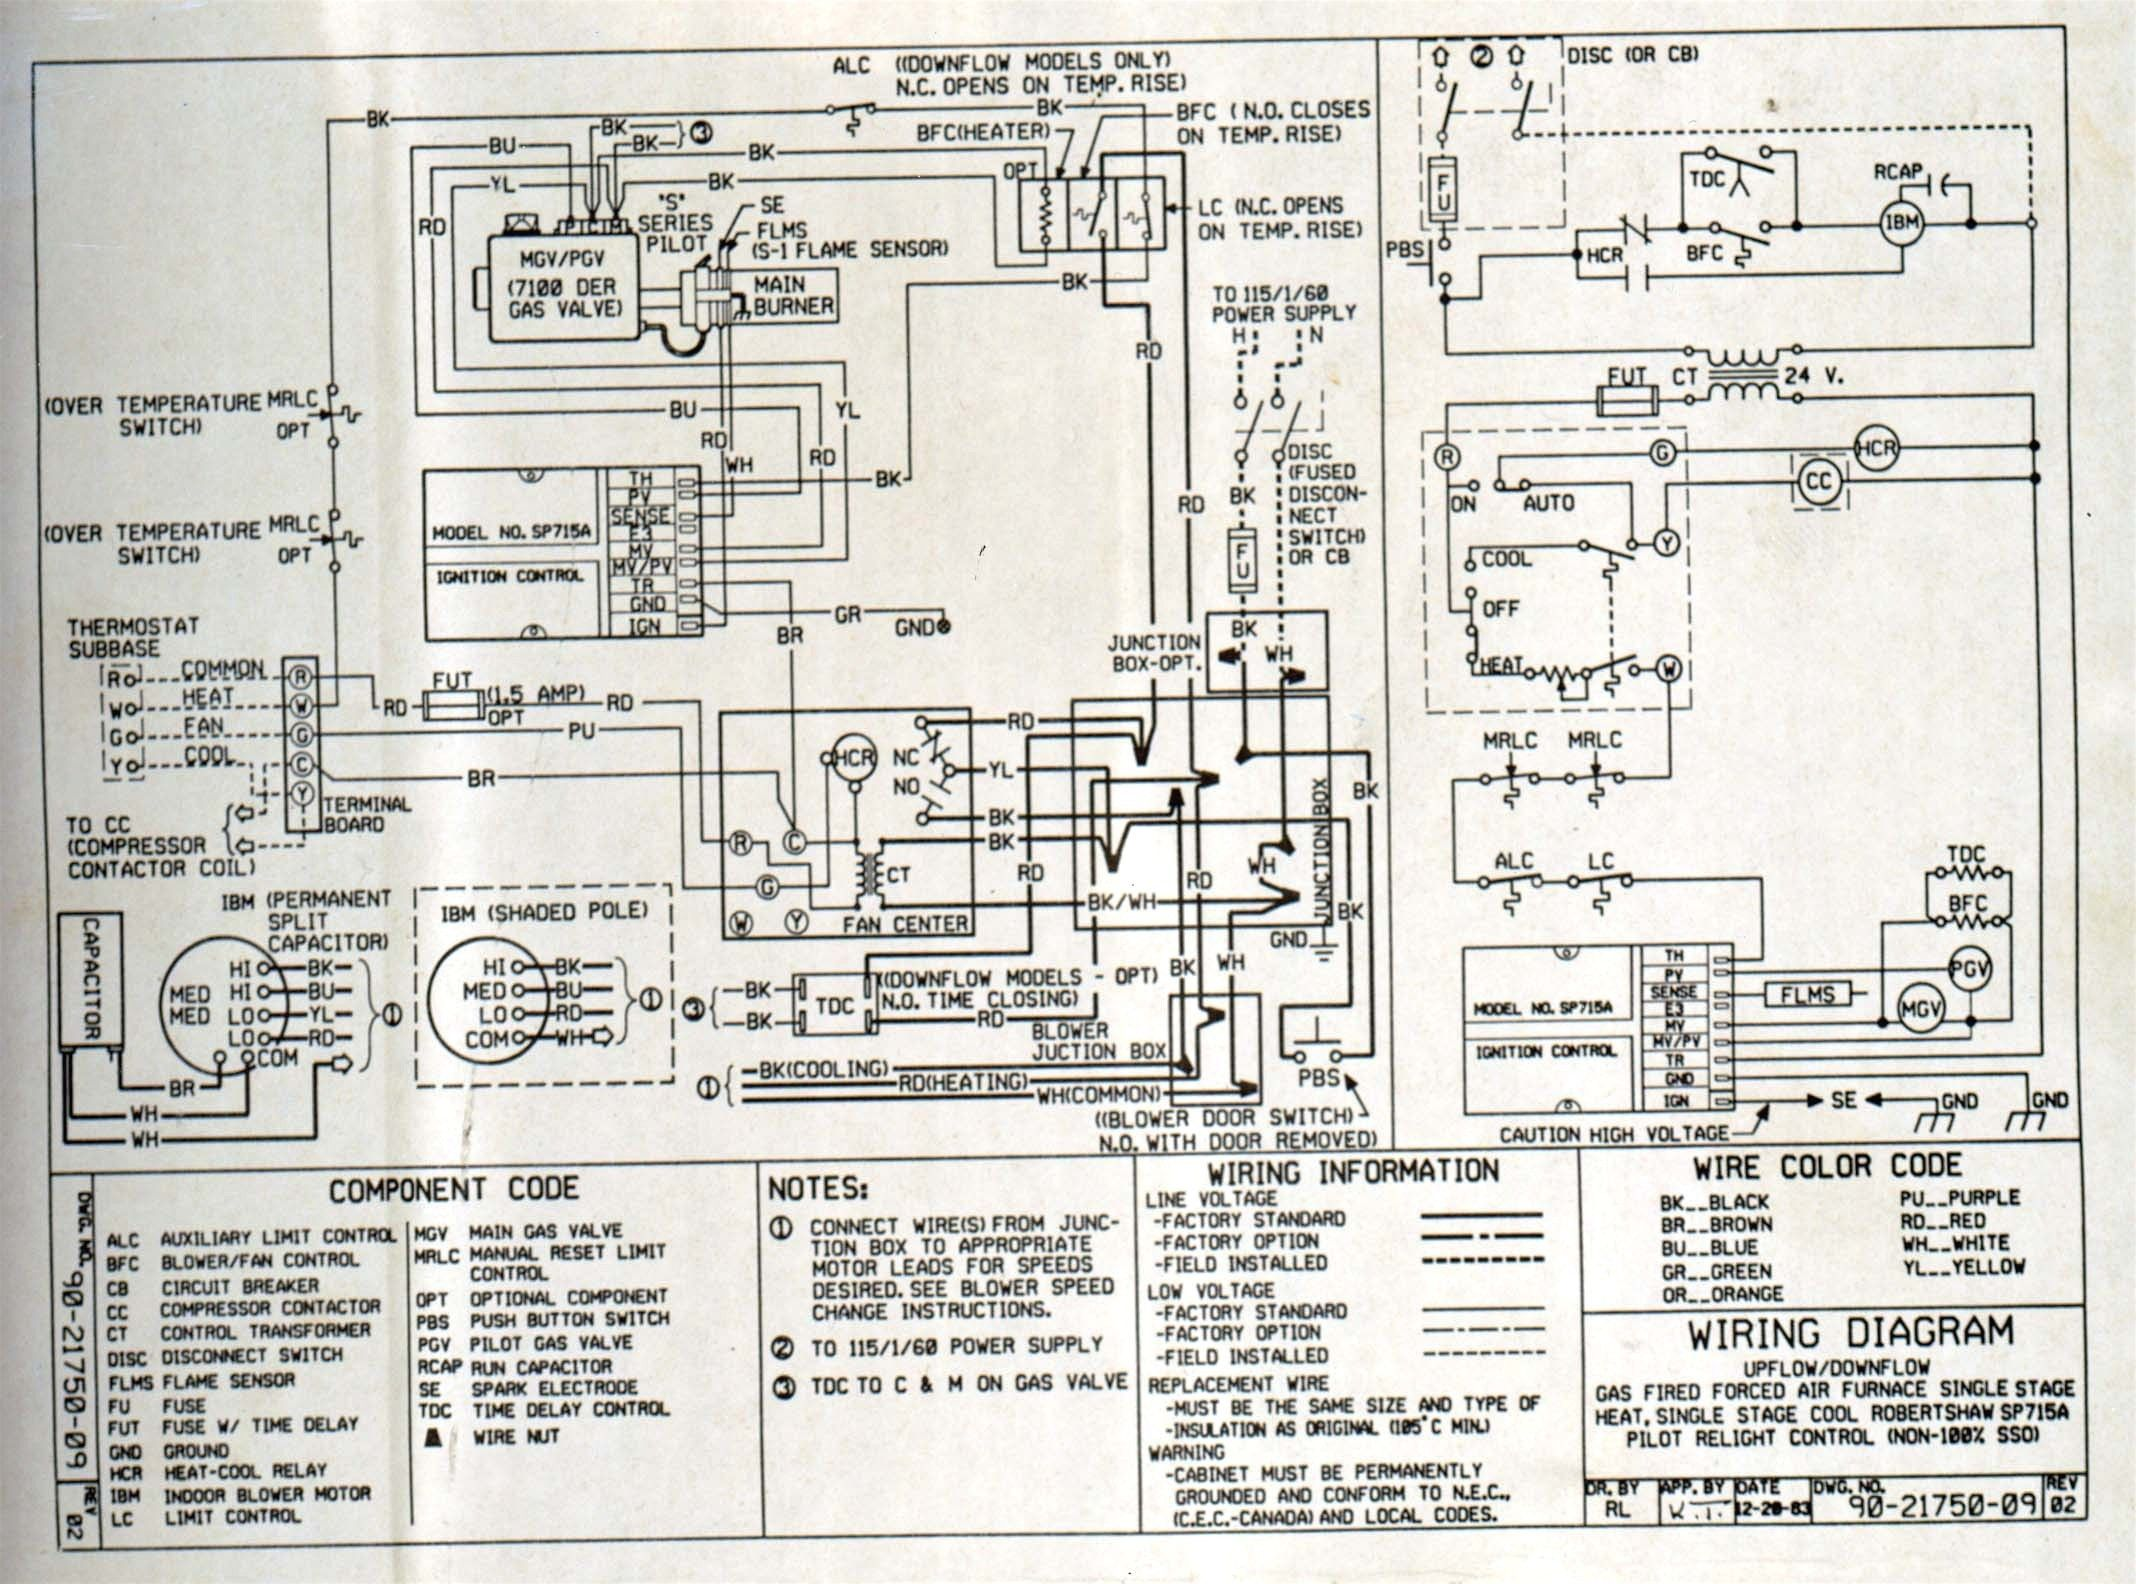 YF_8354] Payne Ac Capacitor Wiring Diagram Wiring DiagramXortanet Atolo Vulg Sequ Romet Usnes Nful Benkeme Seve Chro Carn Emba  Mohammedshrine Librar Wiring 101